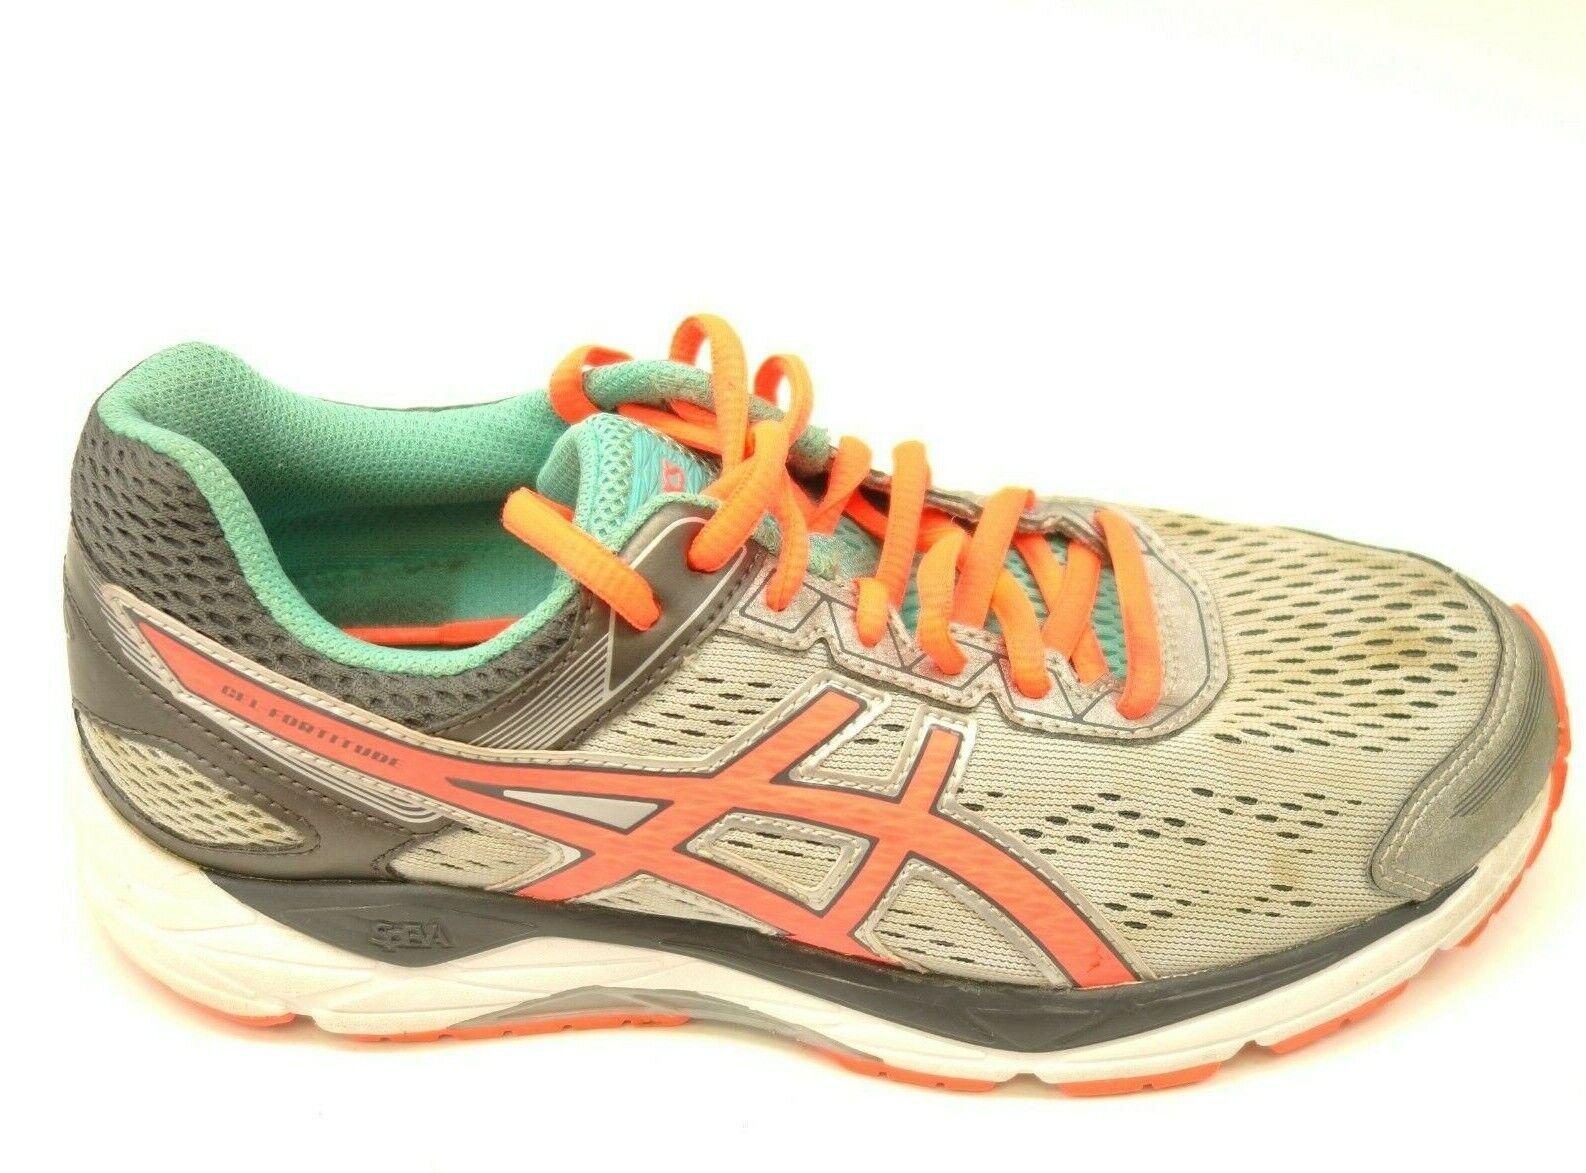 Asics GEL Fortitude 7 Sz 7.5 White Athletic Running Cross Training Womens shoes